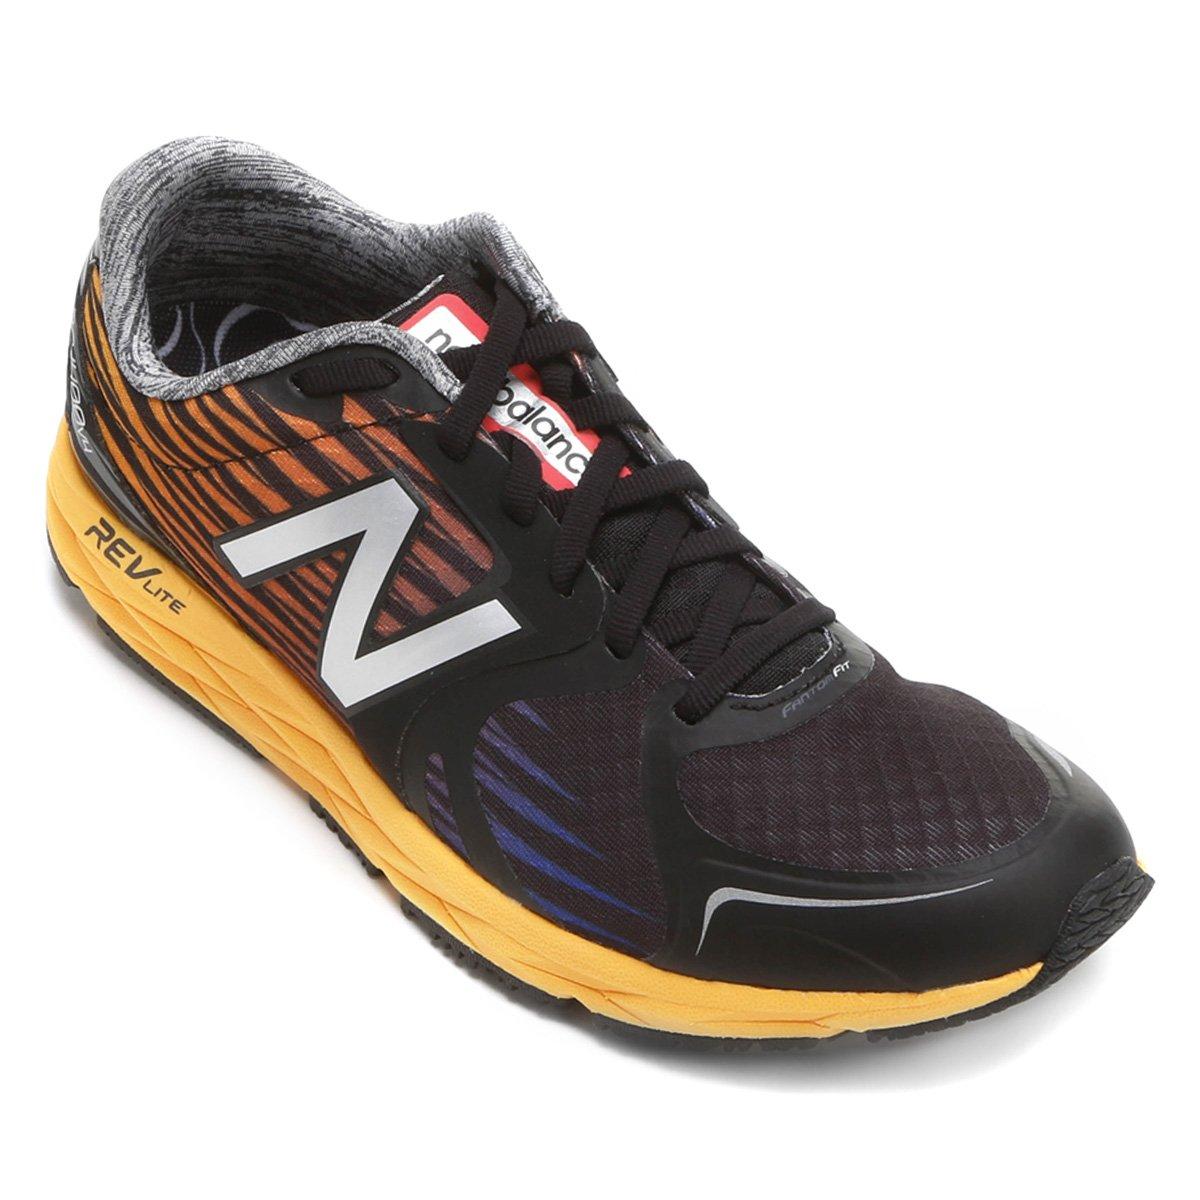 buy popular 414a1 121e7 Tênis New Balance 1400 V4 Masculino - Preto e Laranja